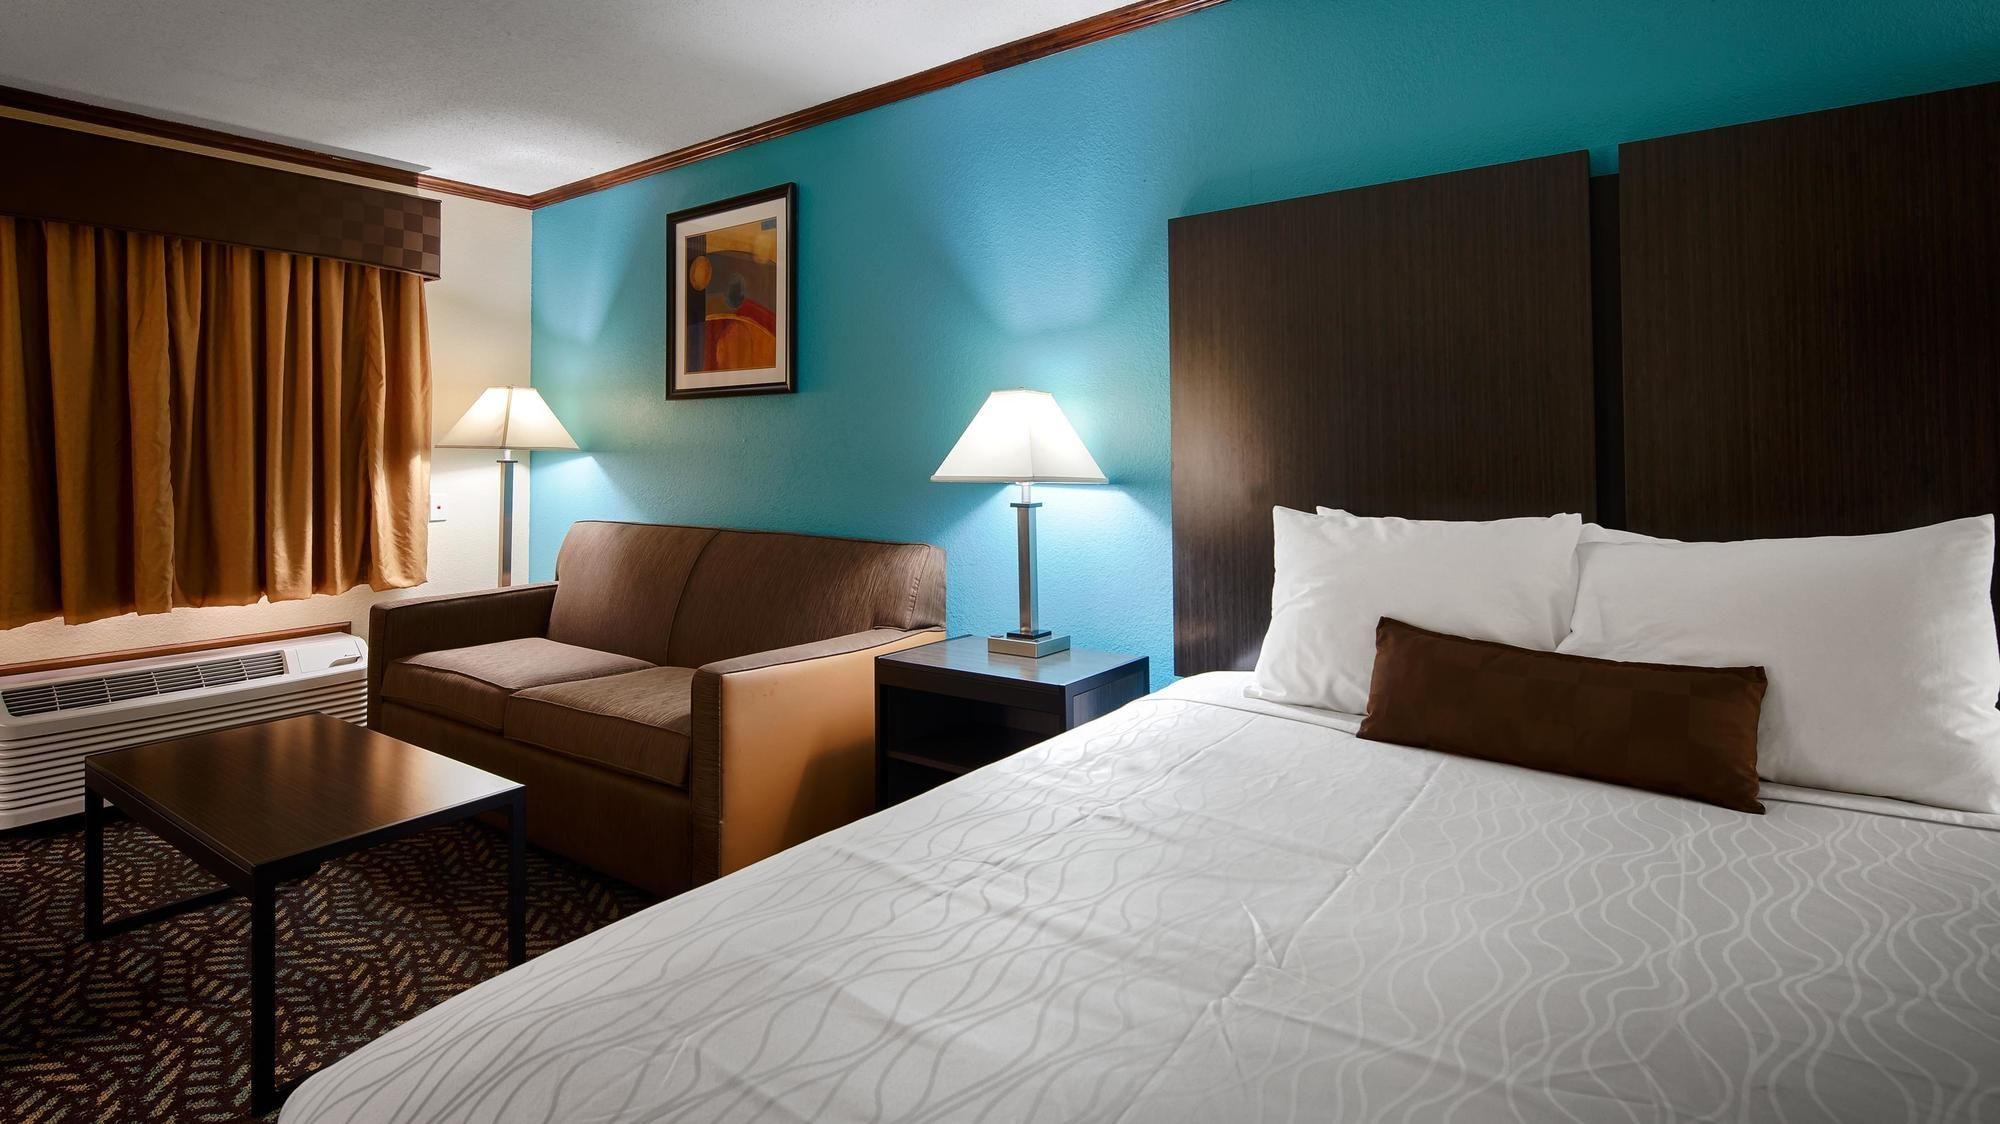 Best Western Fairwinds Inn in Cullman, AL